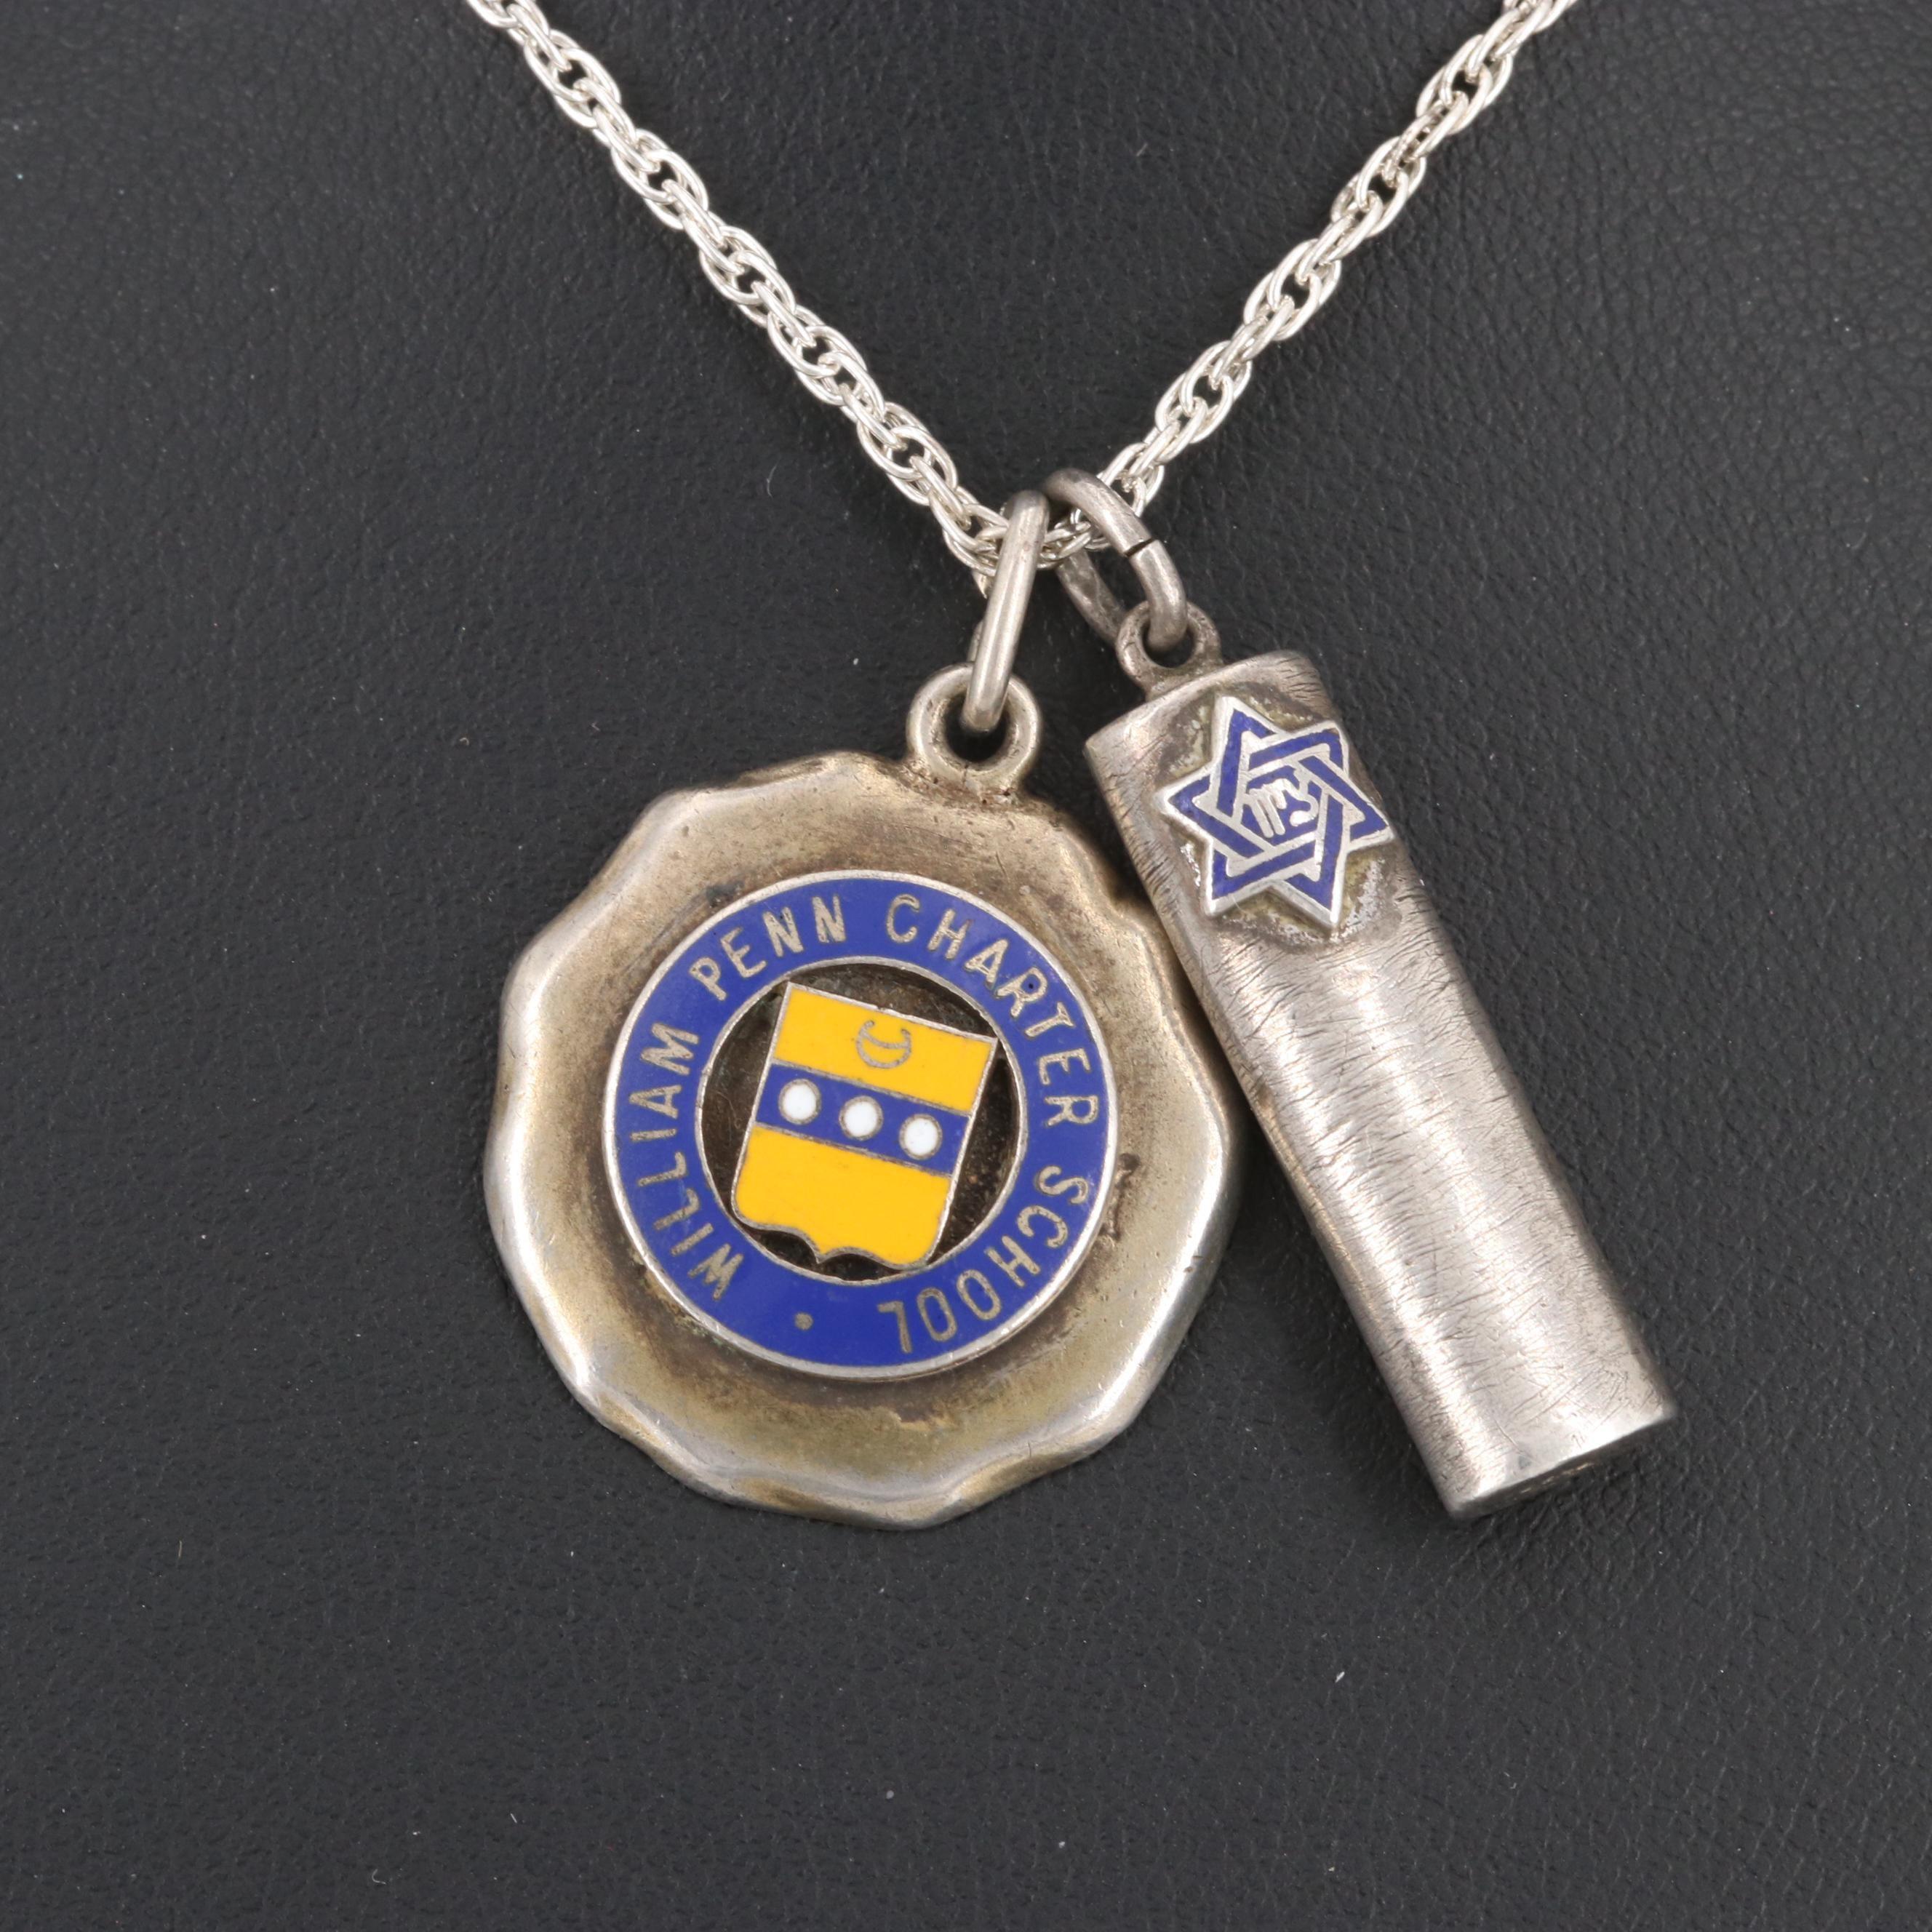 Sterling Silver Enamel Mezuzah and School Pendants on Chain Necklace